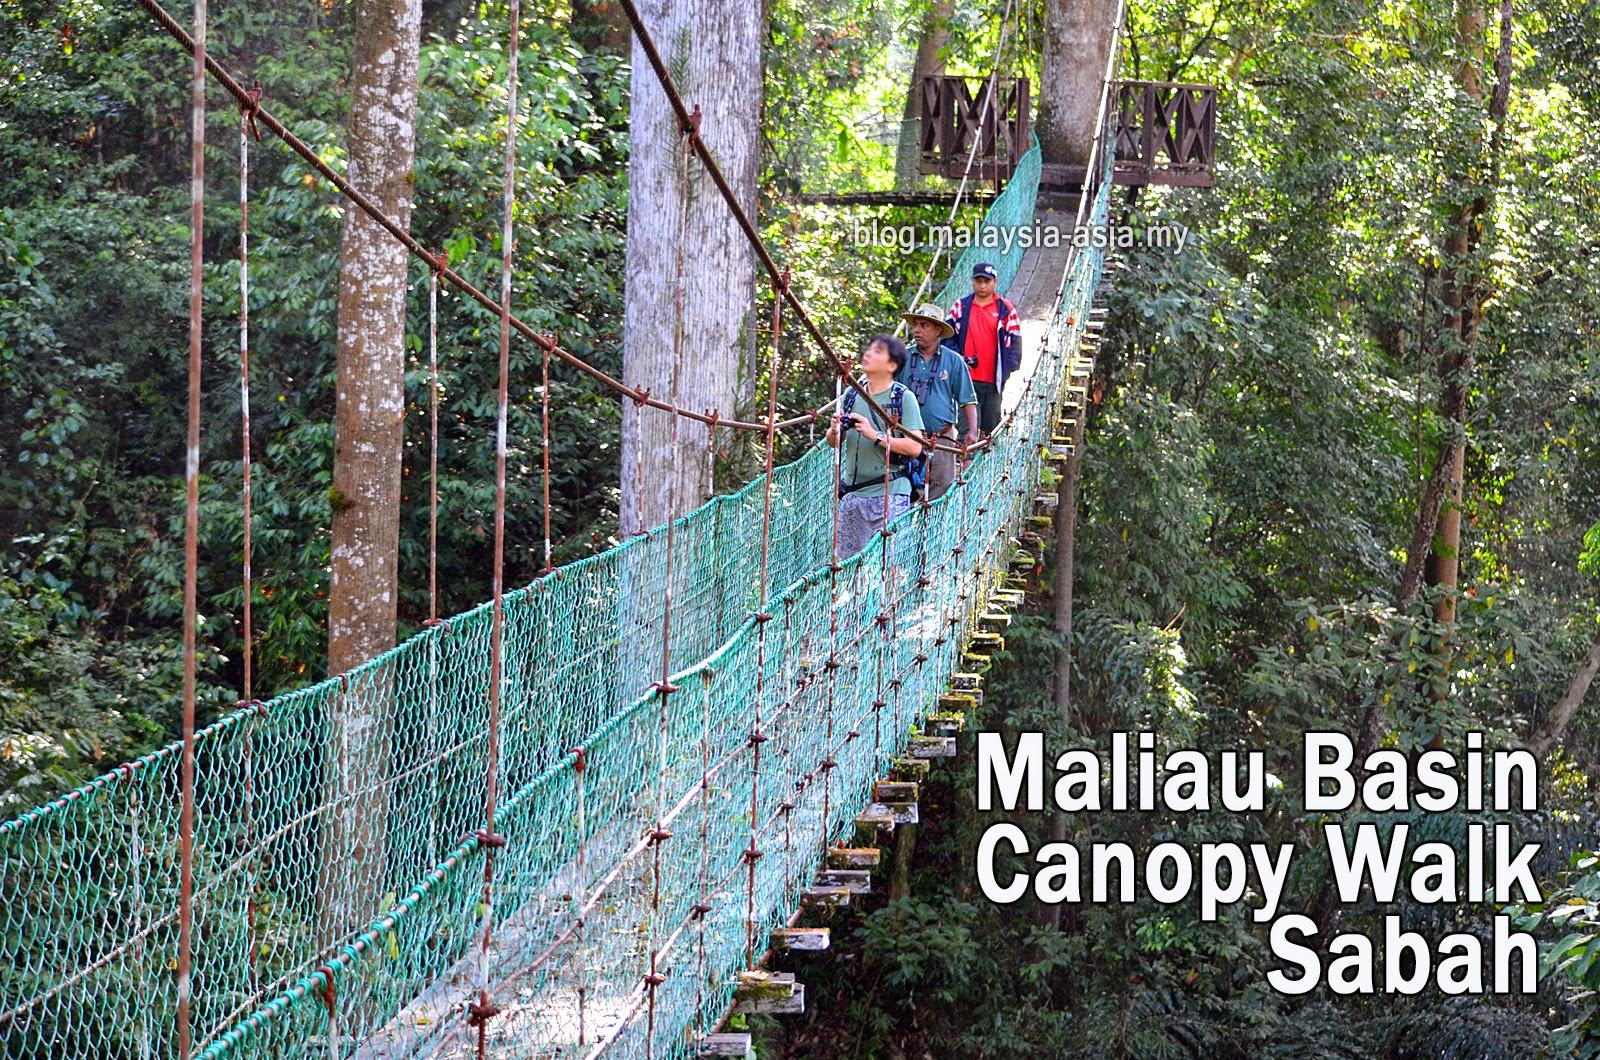 Maliau Basin Skywalk in Sabah